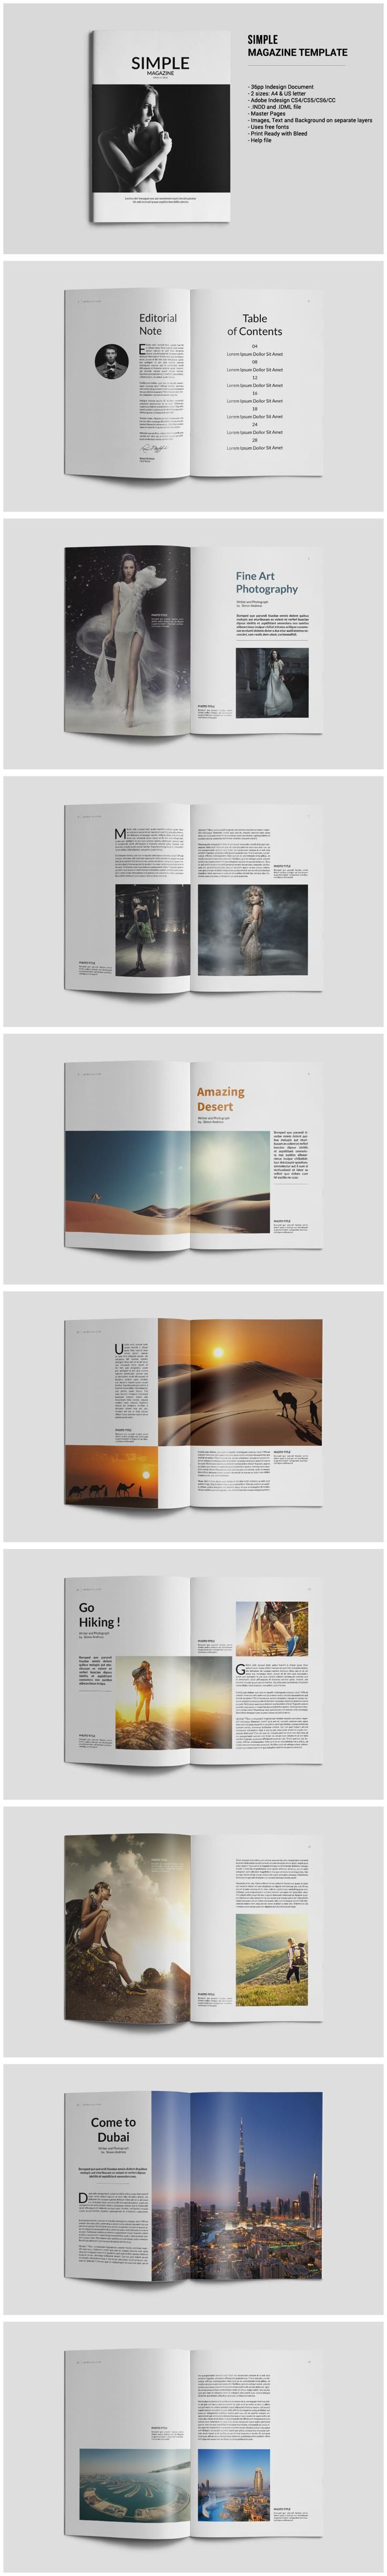 #magazine #design from tujuhbenua | DOWNLOAD: https://creativemarket.com/tujuhbenua/547368-Simple-Magazine-Template?u=zsoltczigler